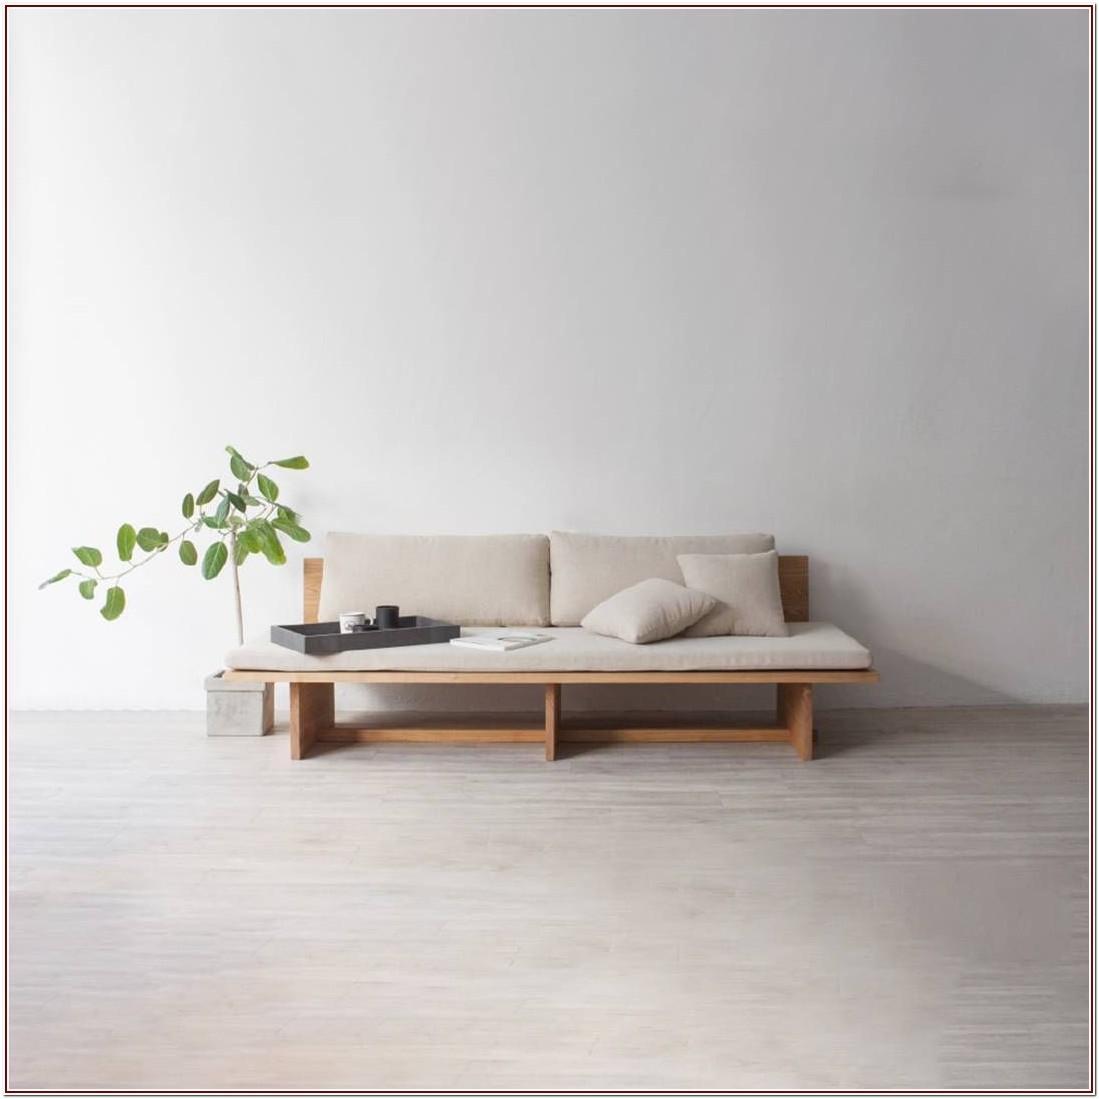 Louis Fashion Living Room Chairs Single Sofa Nordic Creative Leisure